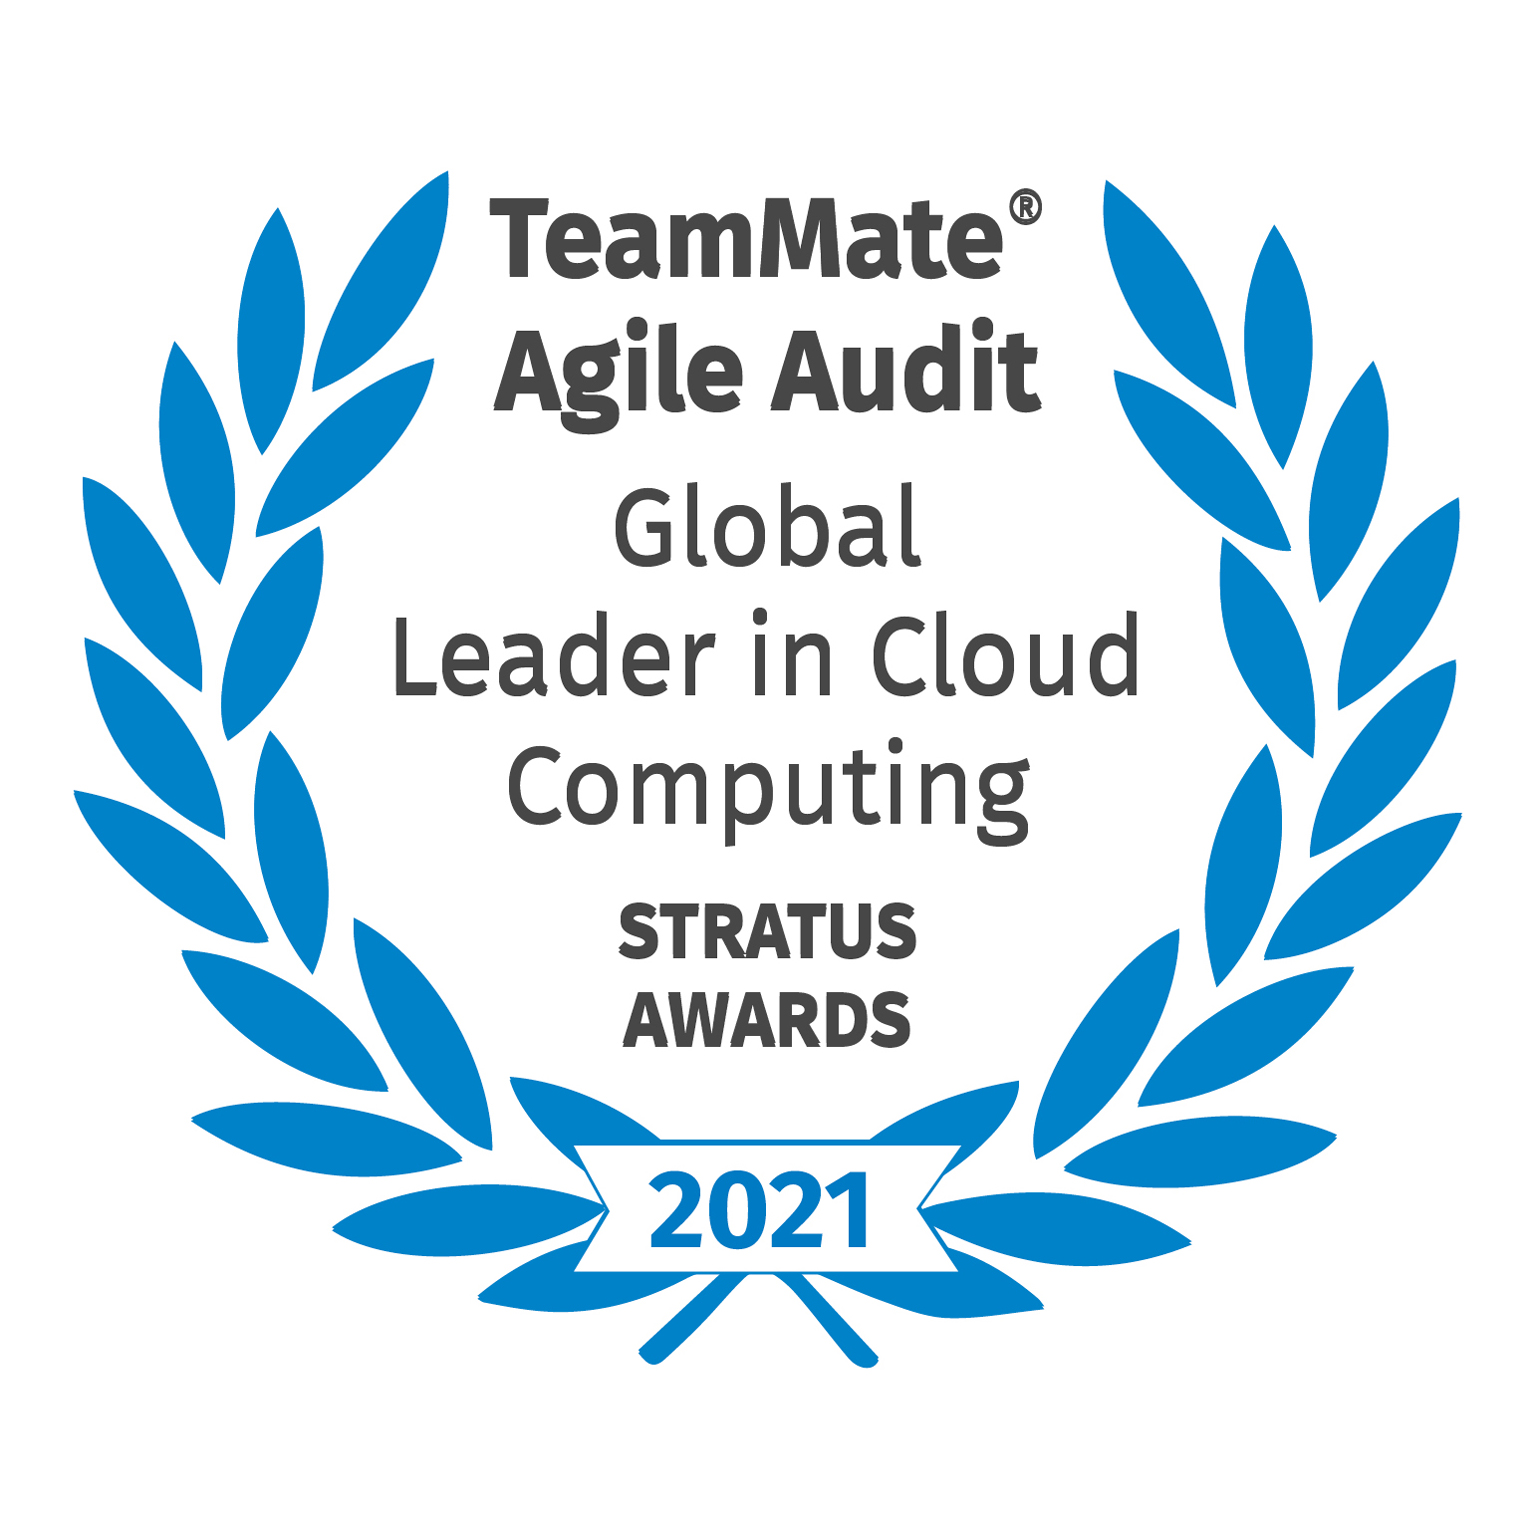 TeamMate Agile Audit - Global Leader in Cloud Computing - Stratus Awards - 2021